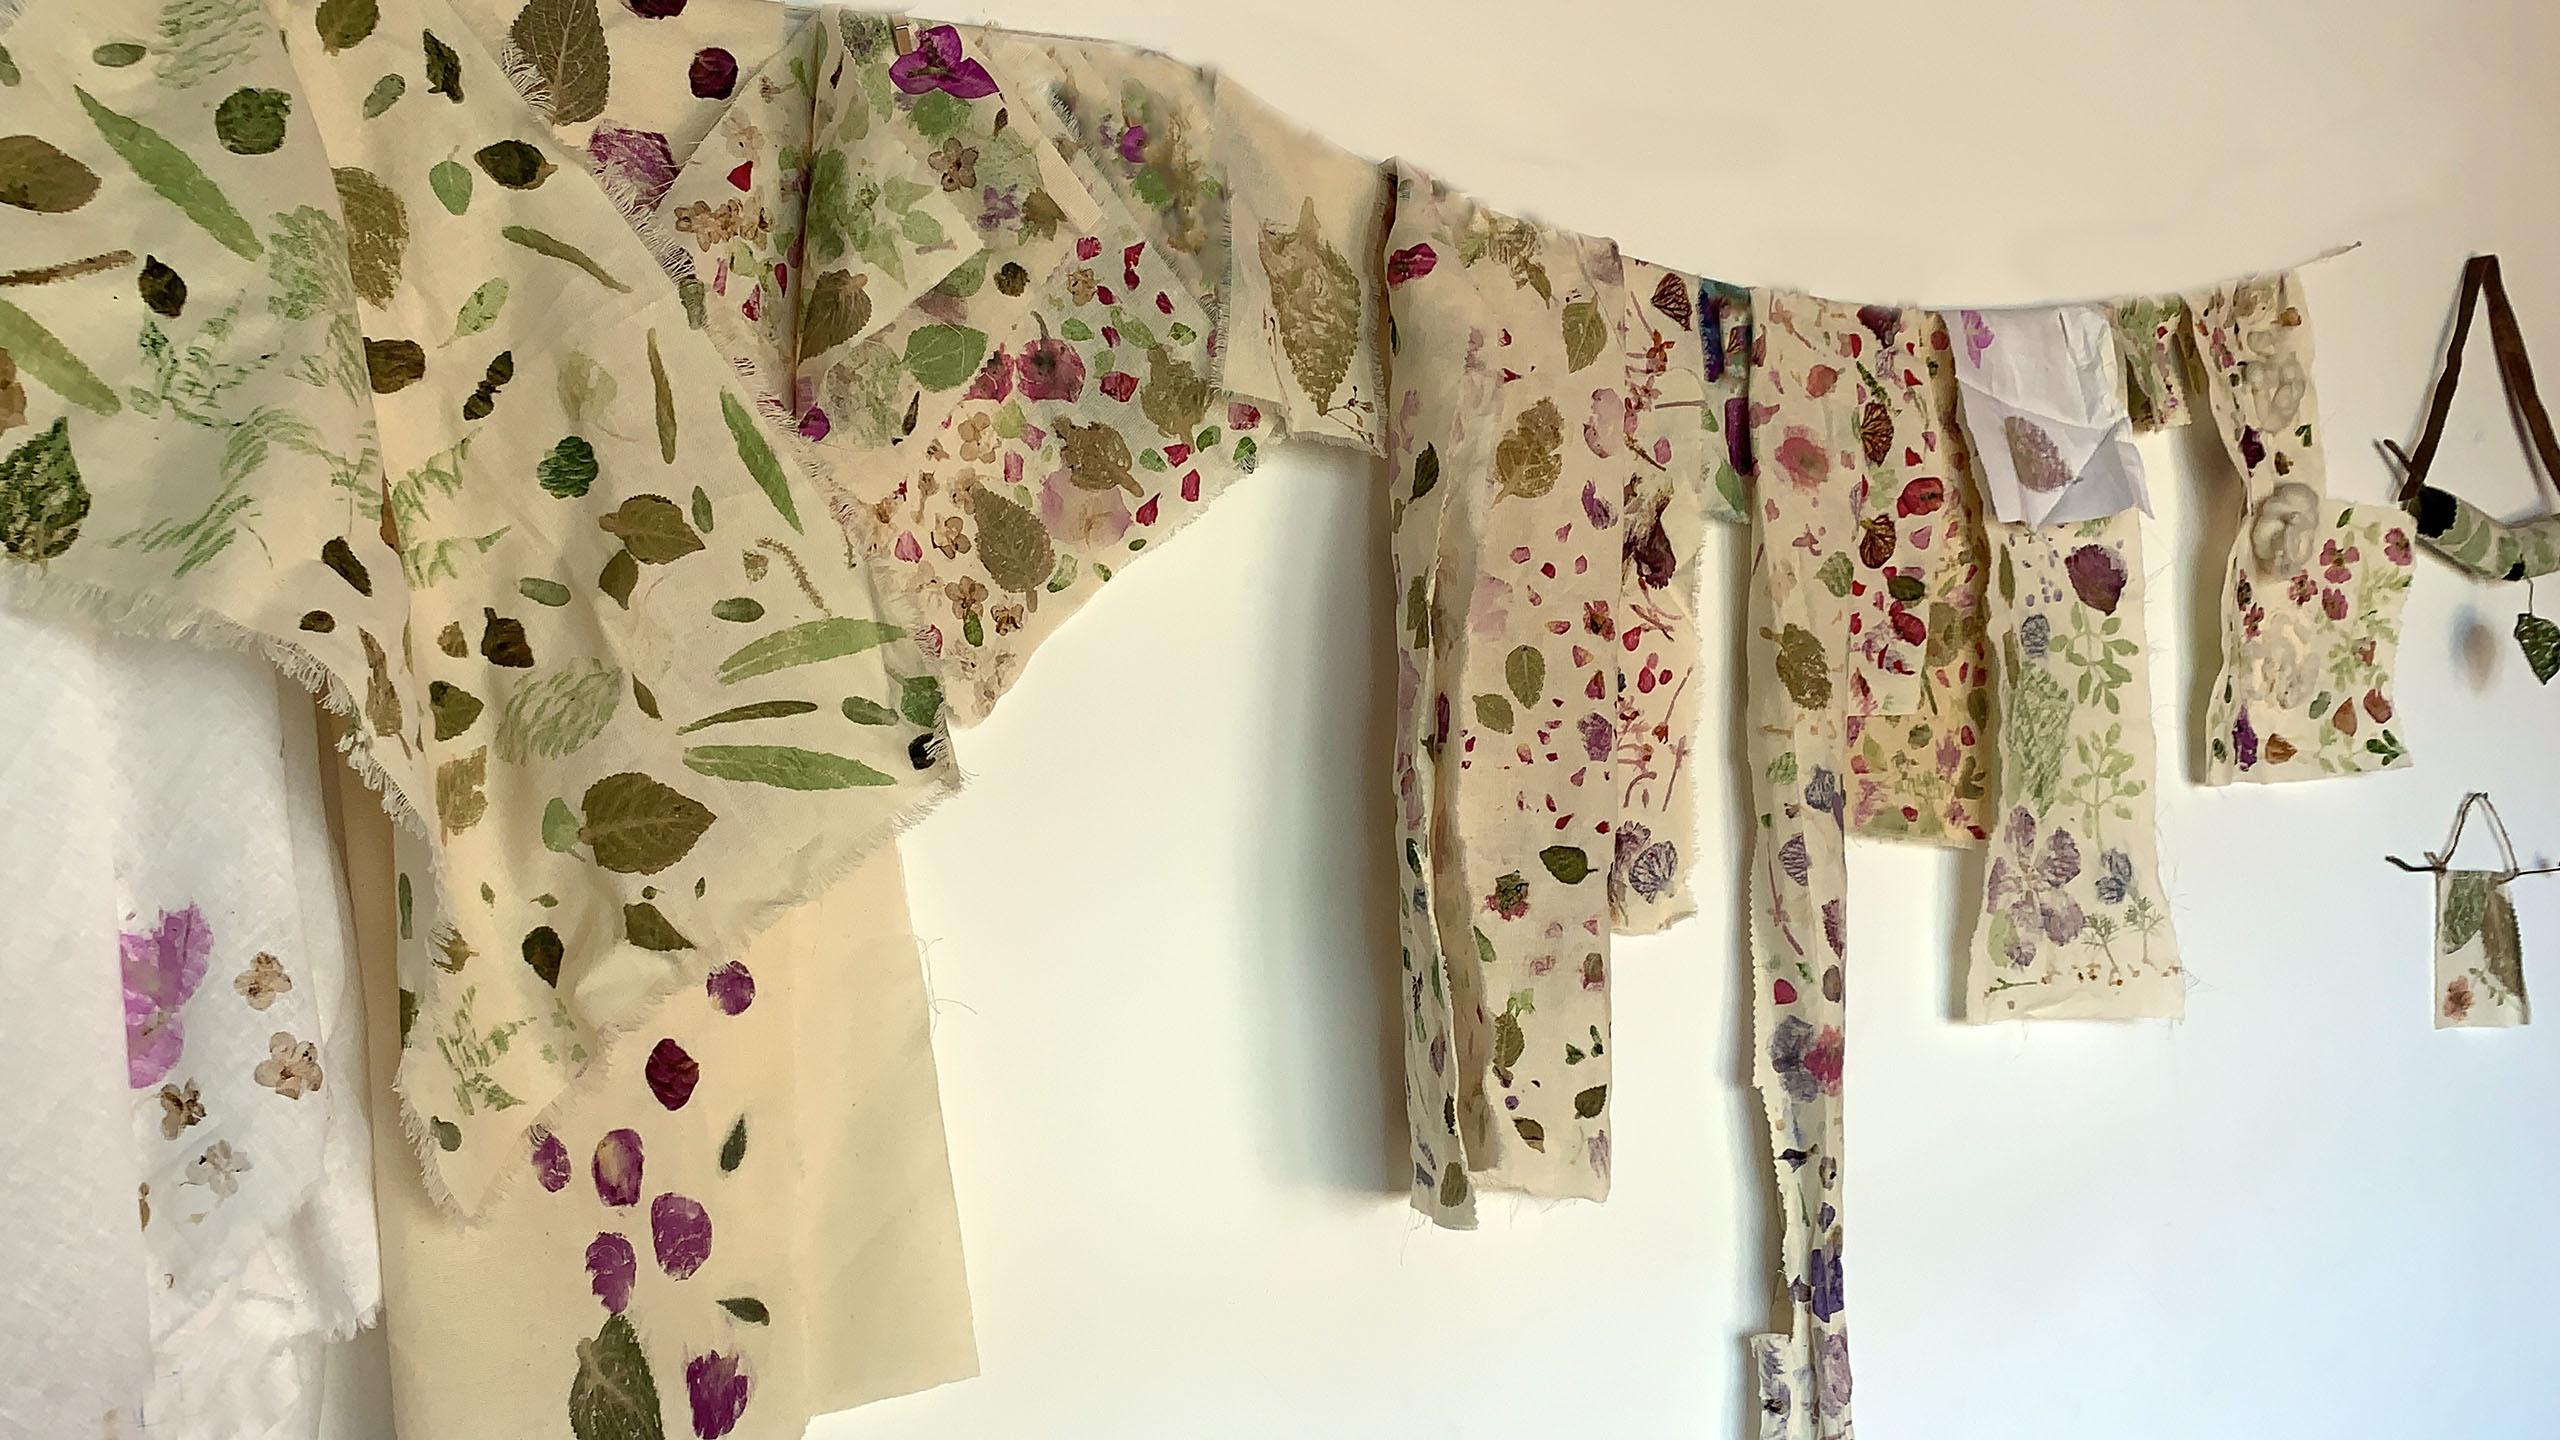 The Flowerpunchers, impressão botânica, botanic printing